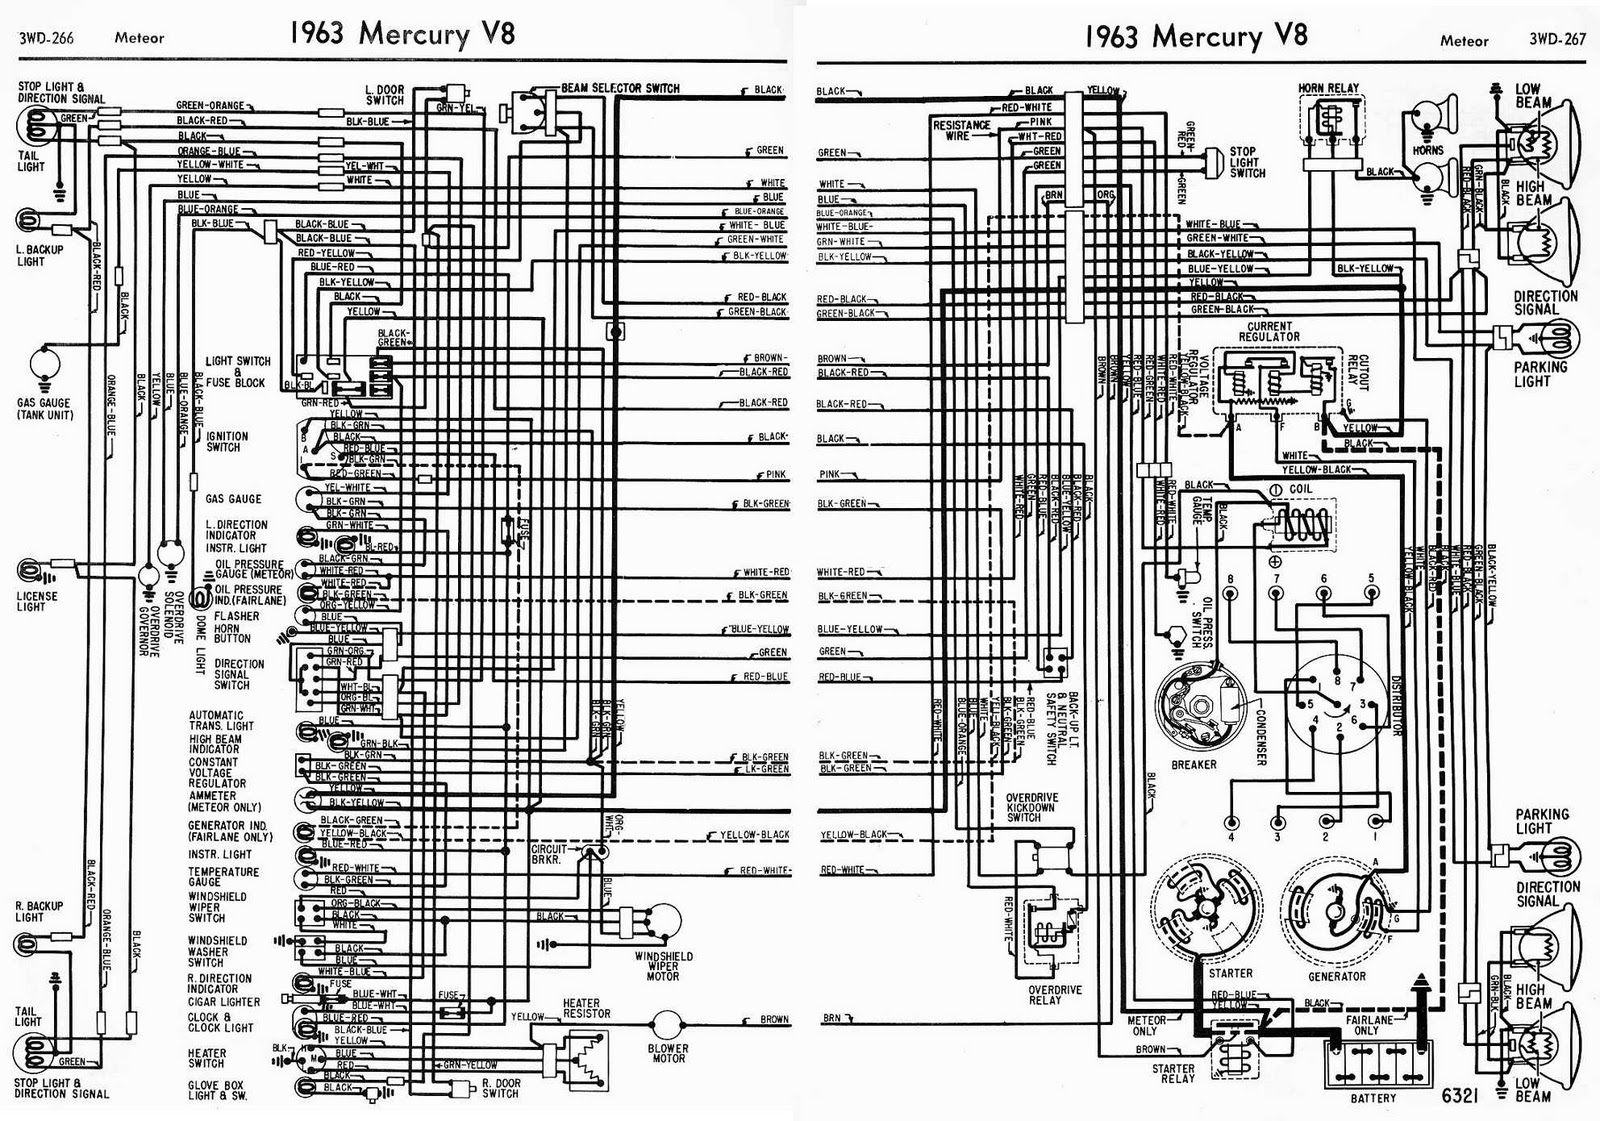 honda sl100 wiring diagram honda sl100 speedometer wiring